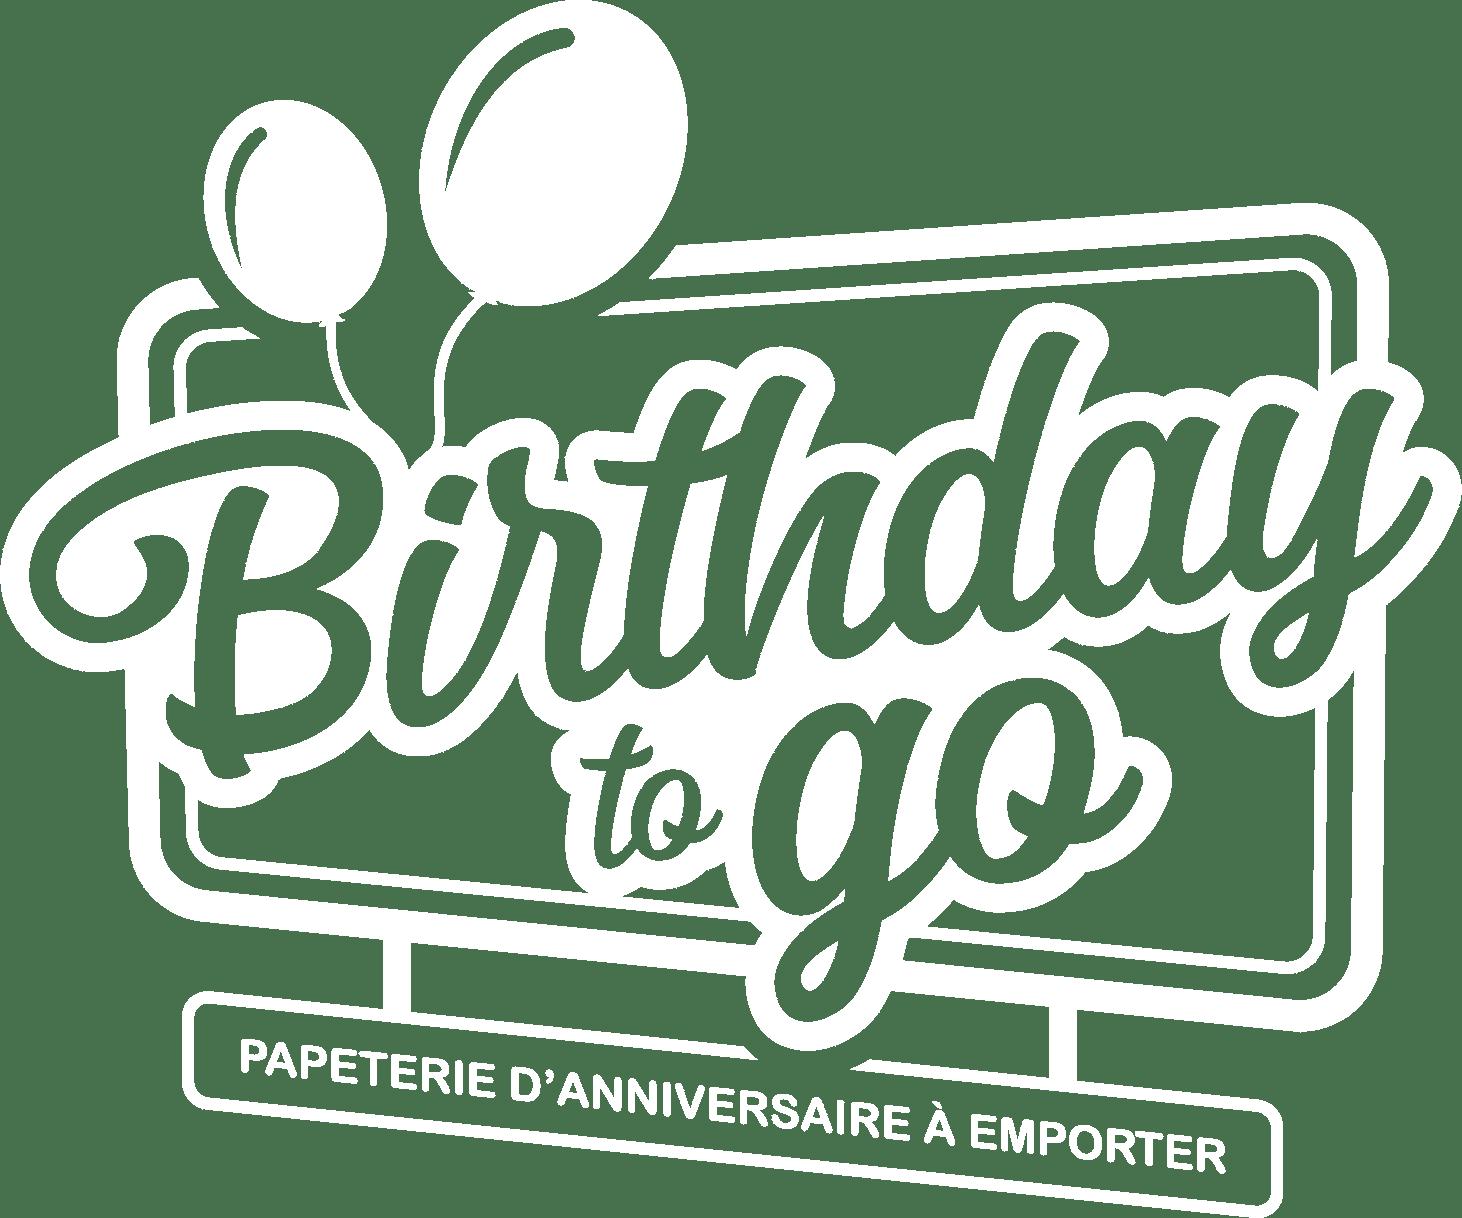 référence client Birthday To Go